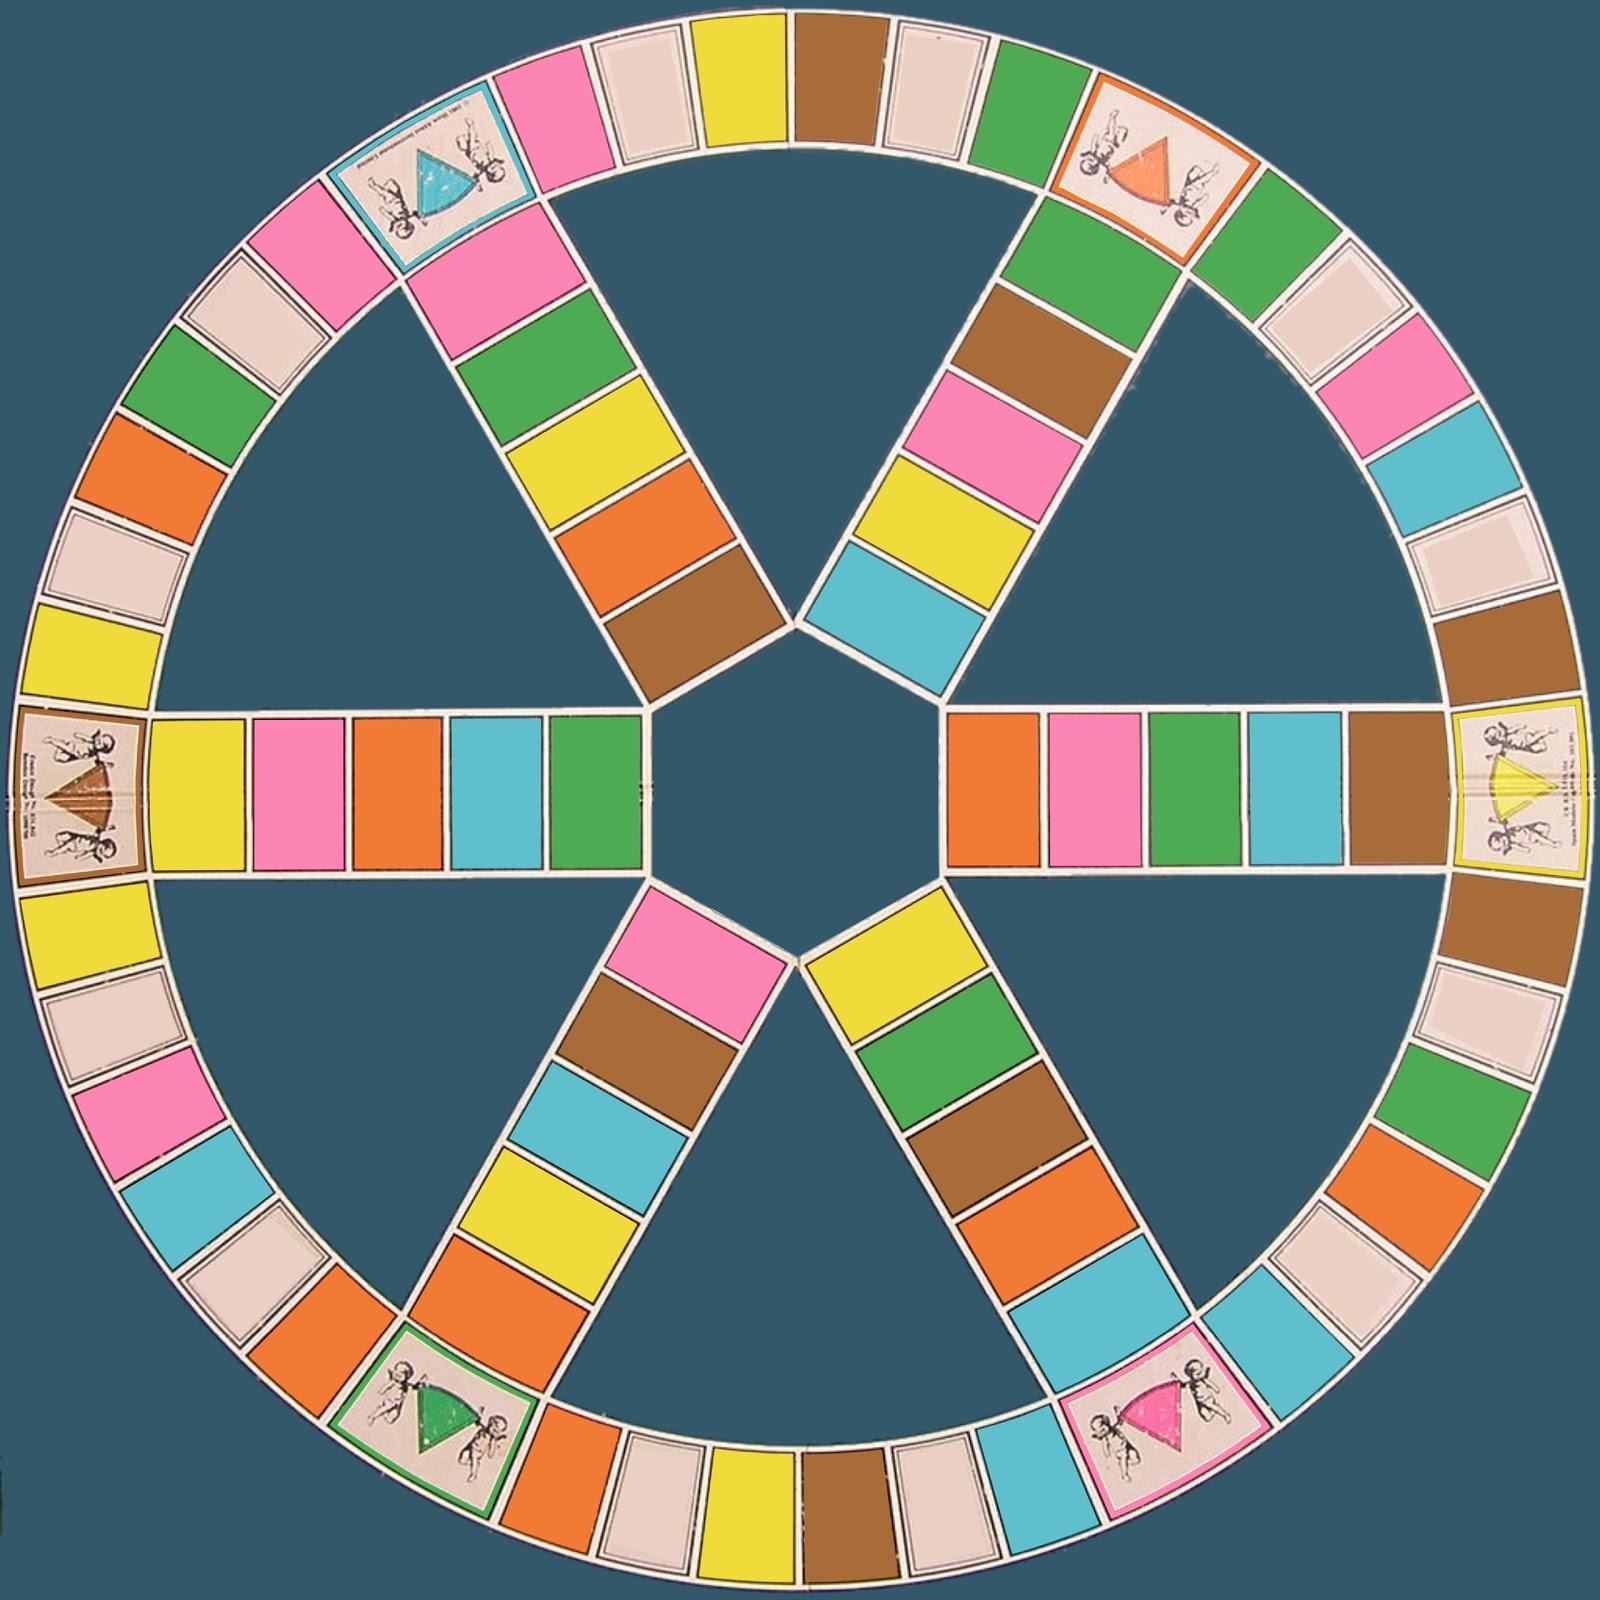 jugar gratis al trivial: